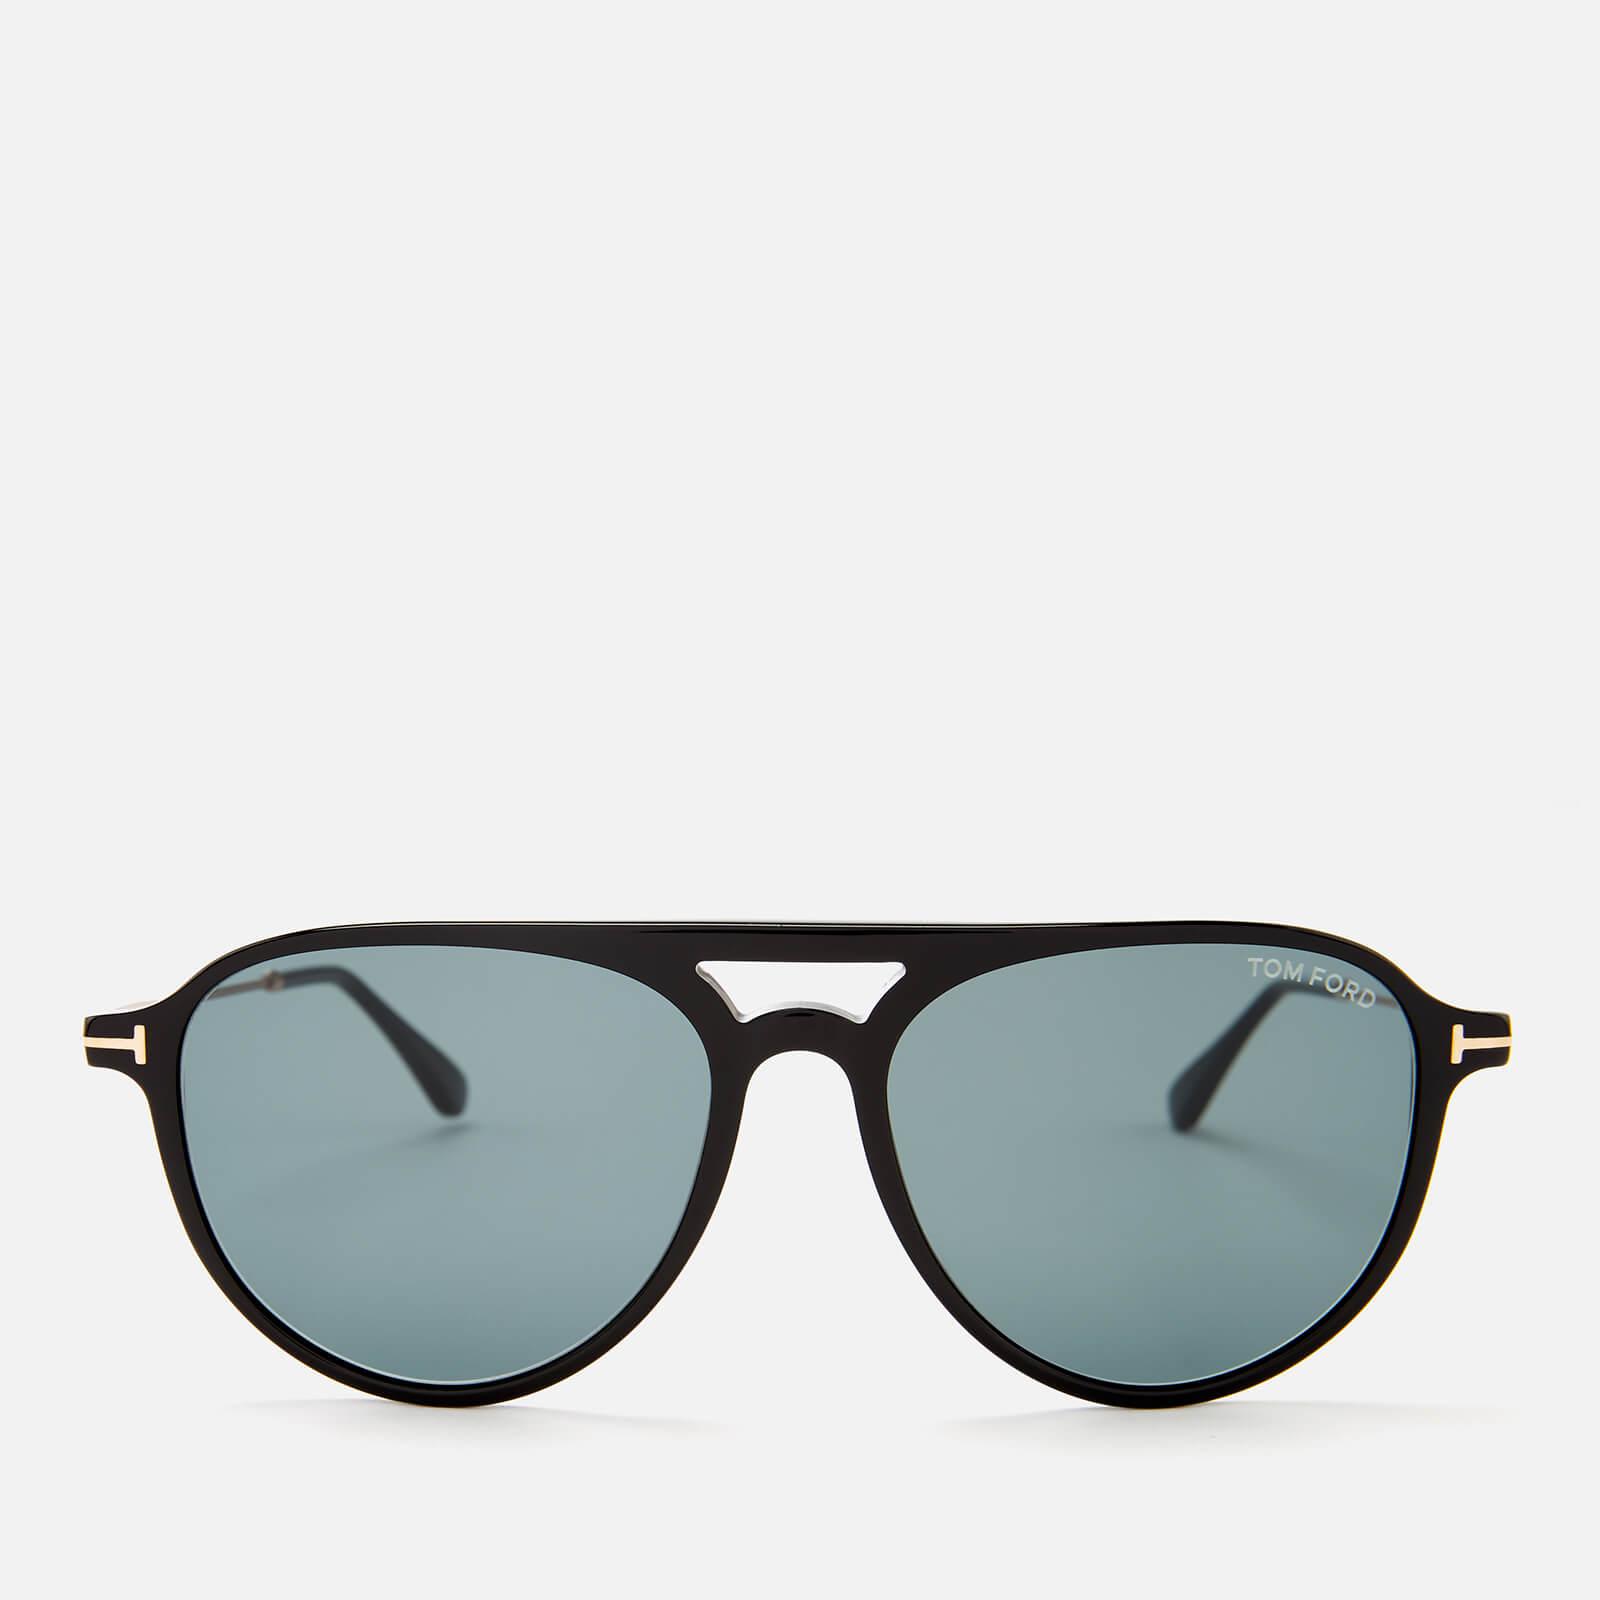 96ac367213e1 Tom Ford Men s Carlo Aviator Style Sunglasses - Shiny Black Blue - Free UK  Delivery over £50